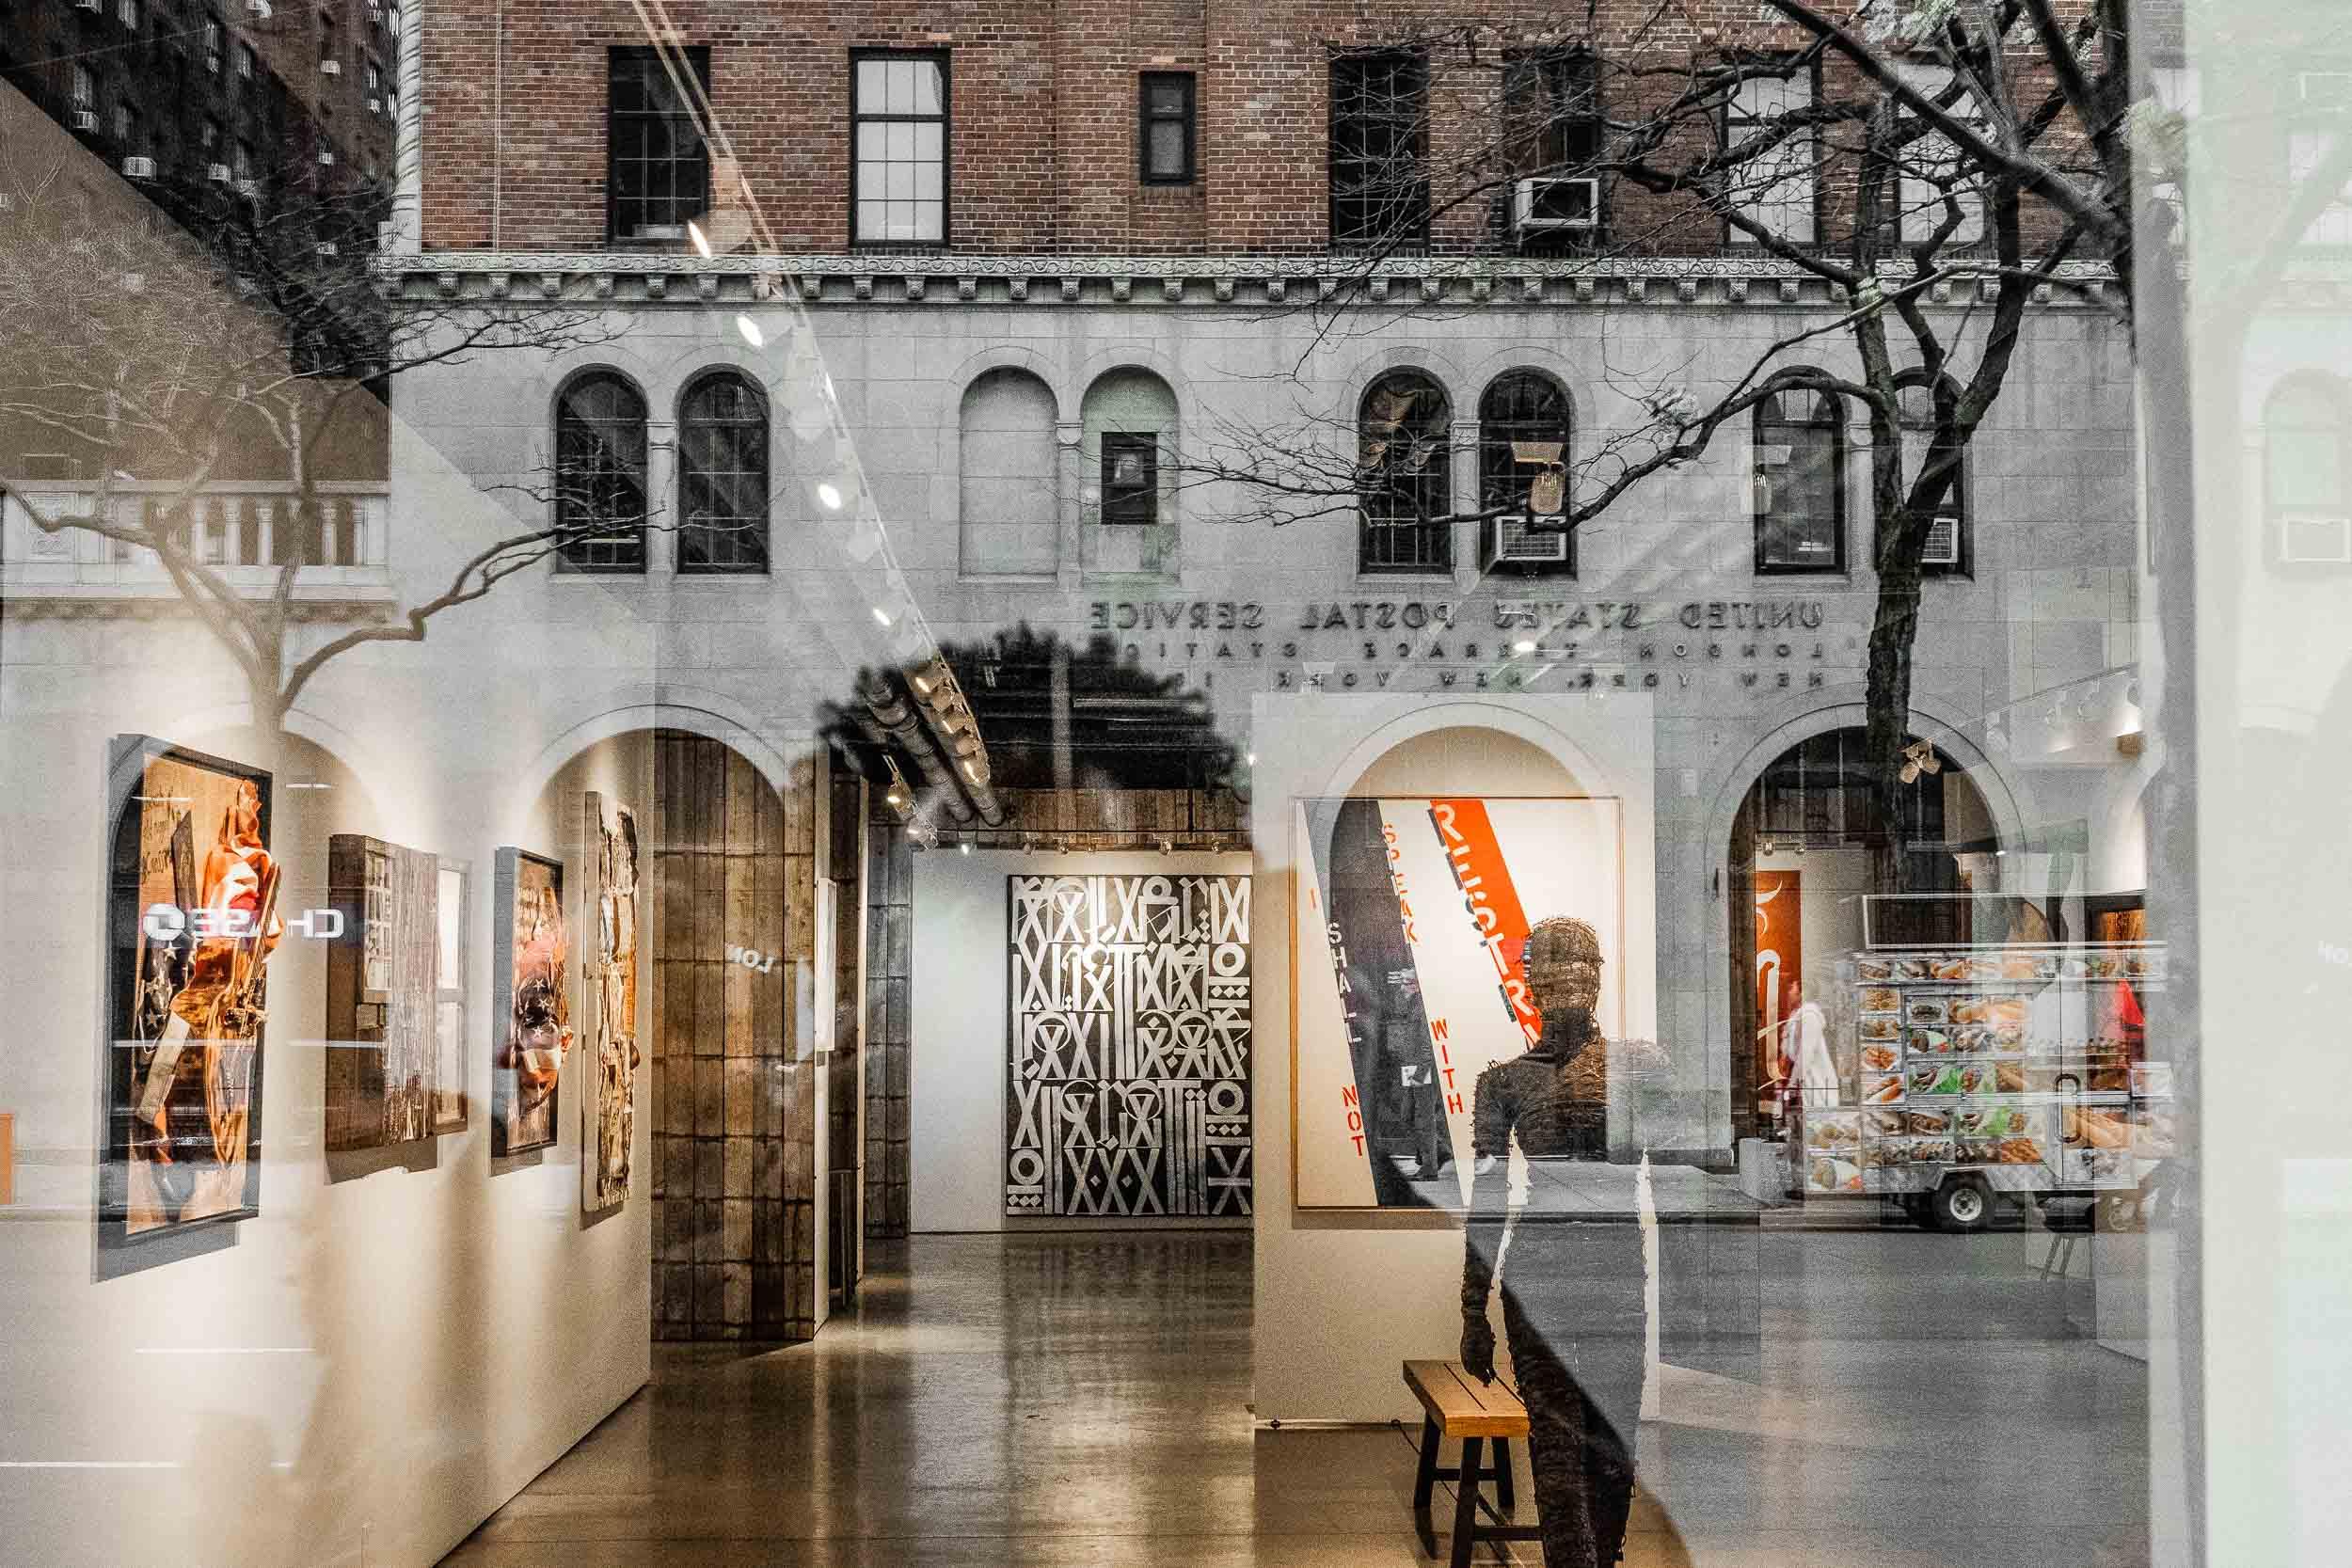 CHELSEA POST OFFICE, New York City